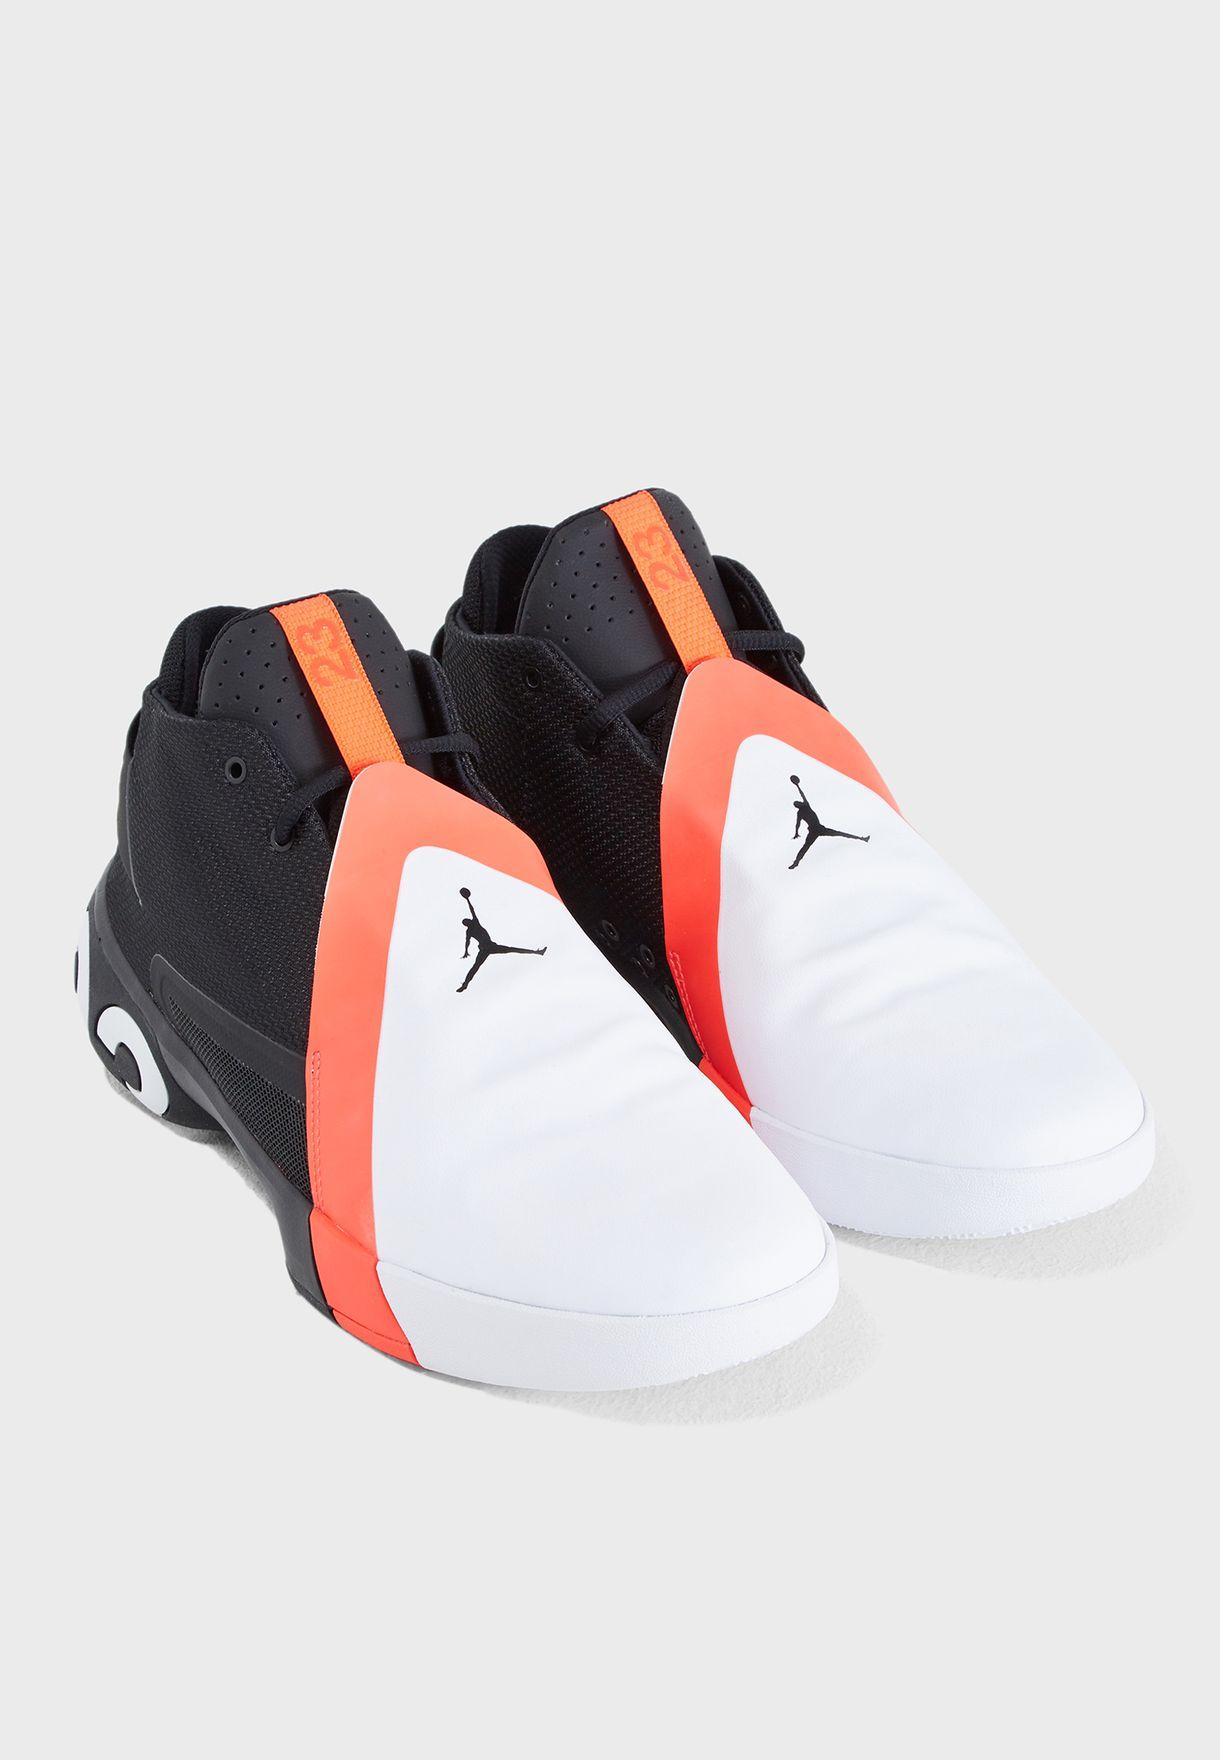 Shop Nike multicolor Jordan Ultra Fly 3